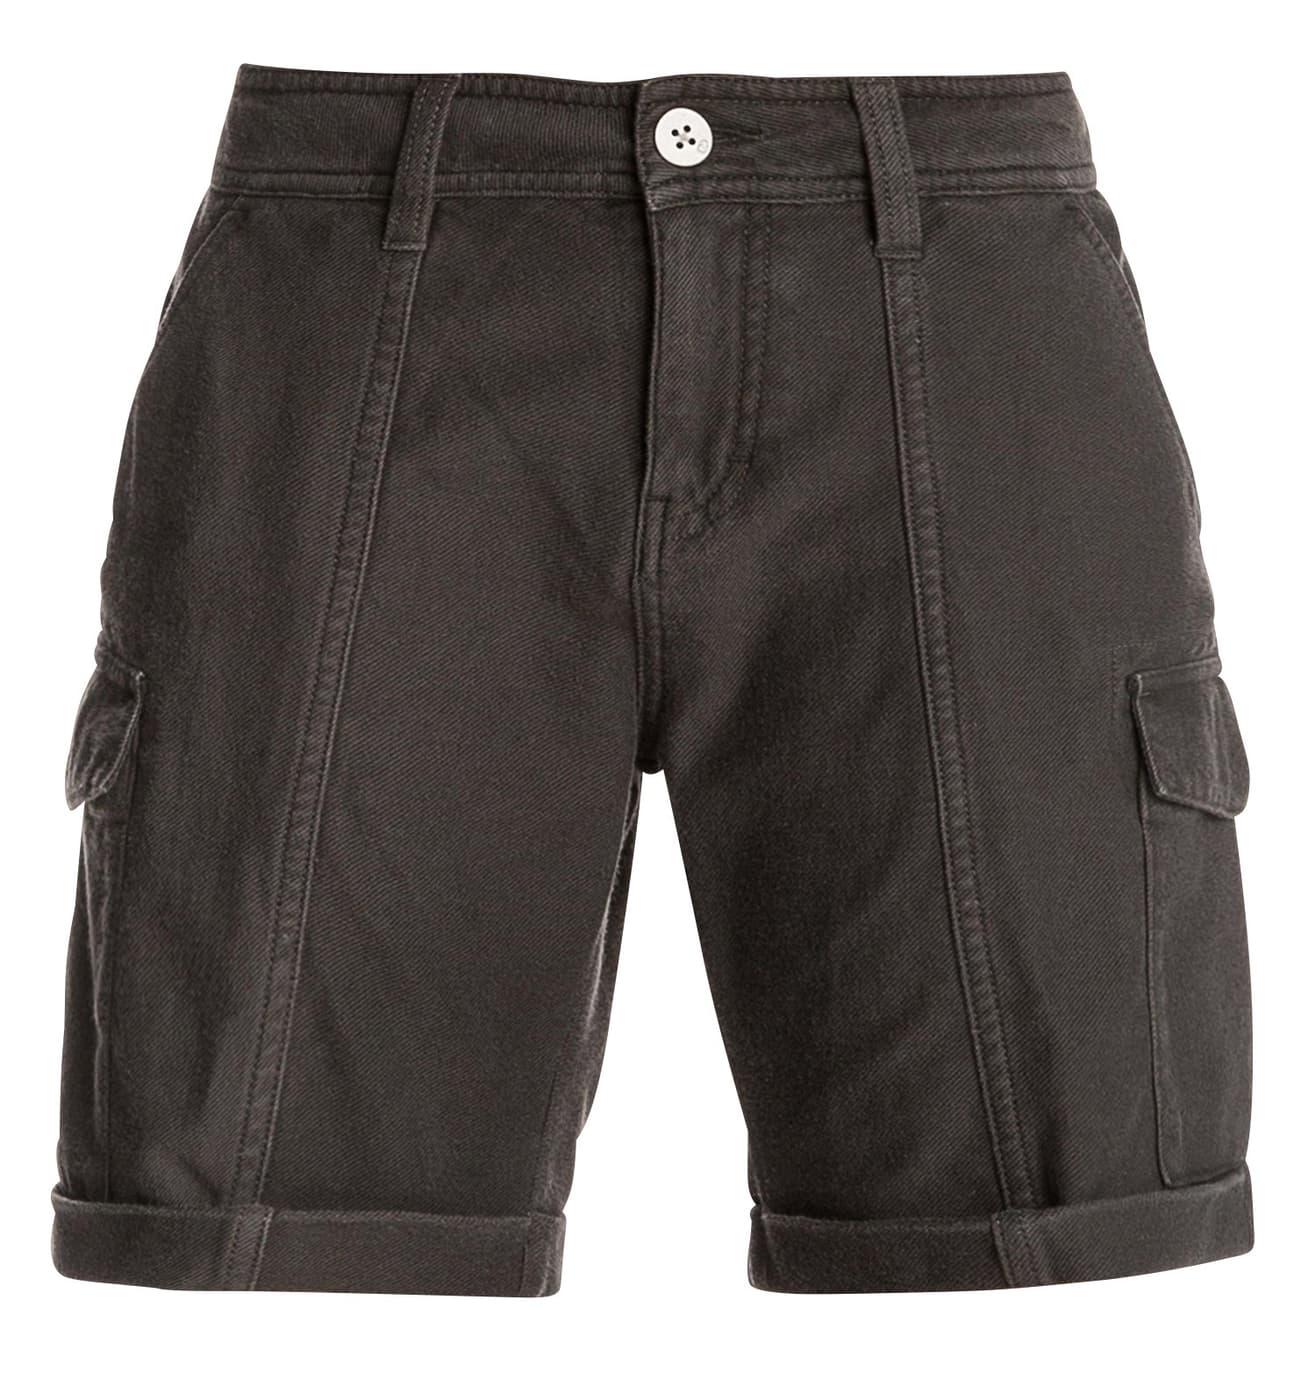 634a468596 Rip Curl Tropic Cargo Short Damen Shorts ...